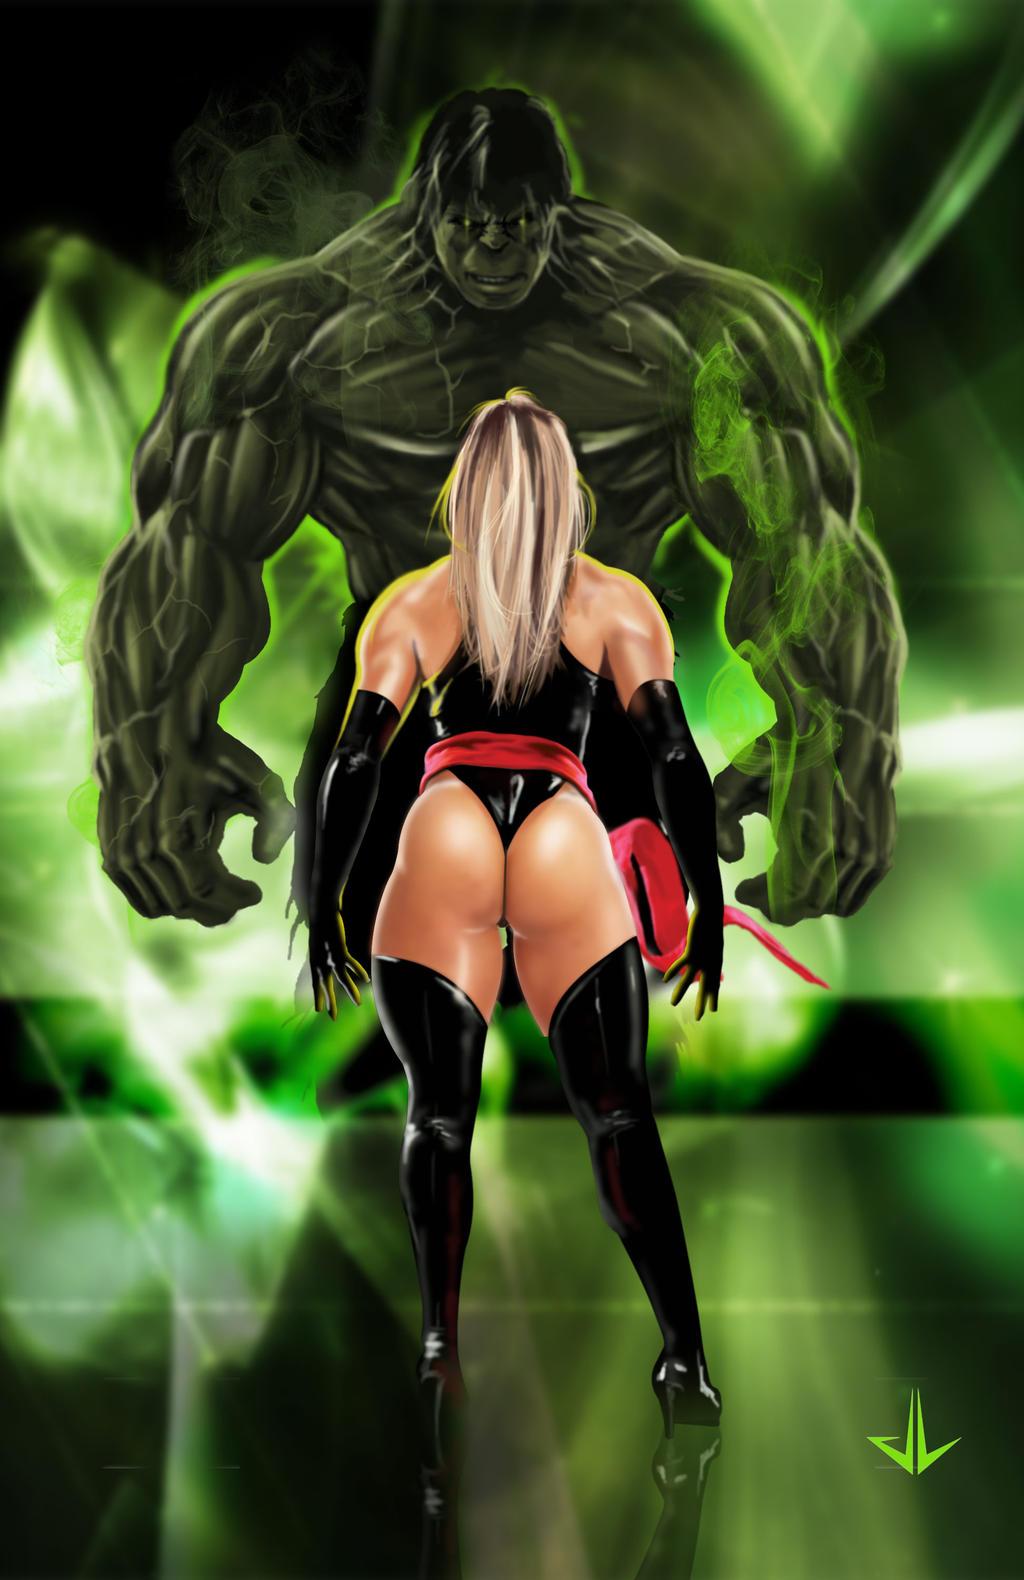 hulk_vs_miss_marvel_by_luisrodri-d6gg4z4